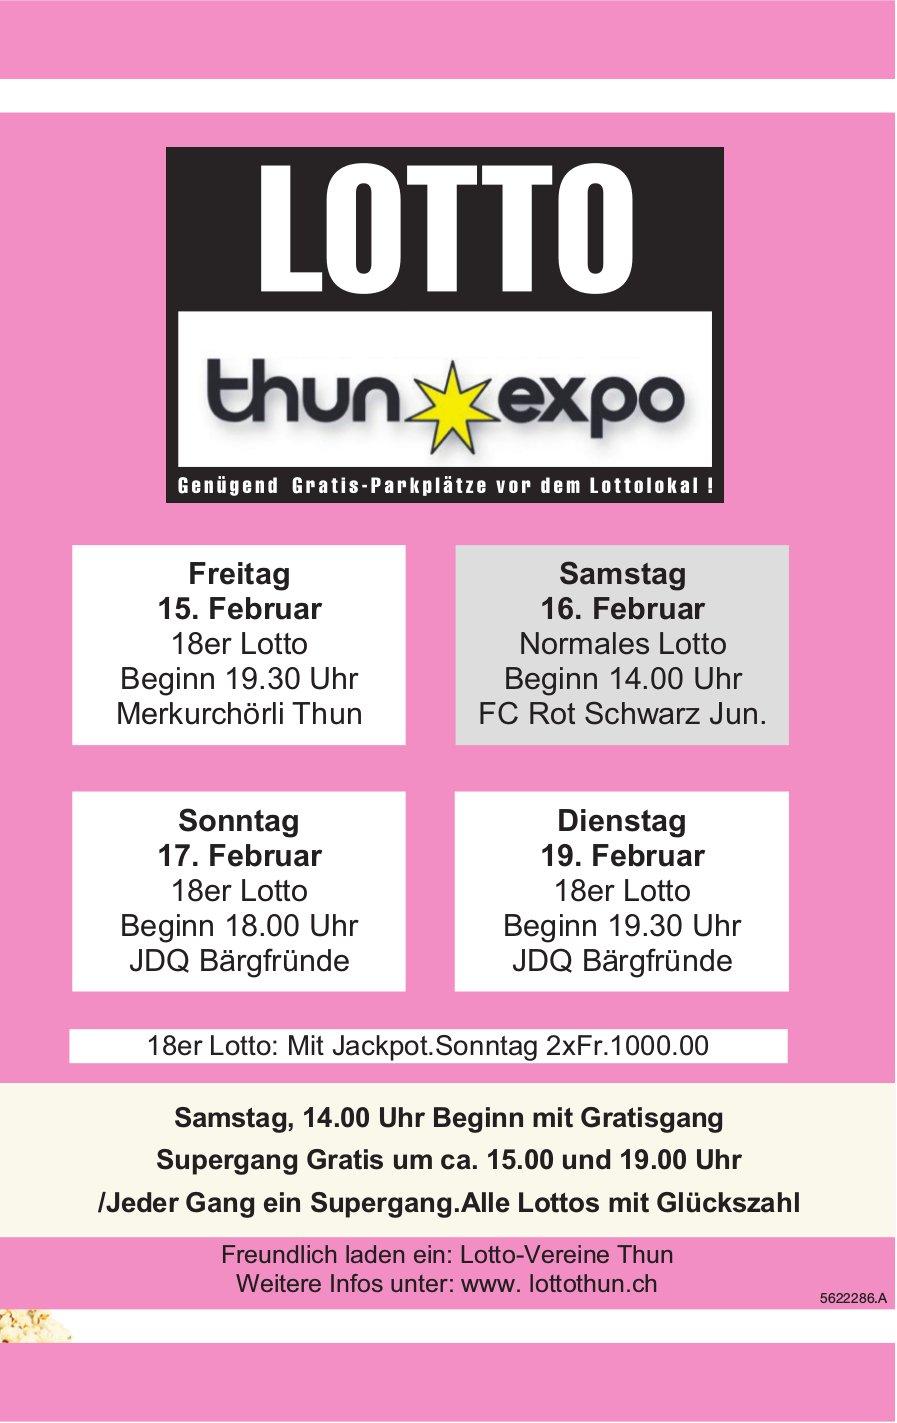 LOTTO Thun Expo - 15./16./17./19. Februar